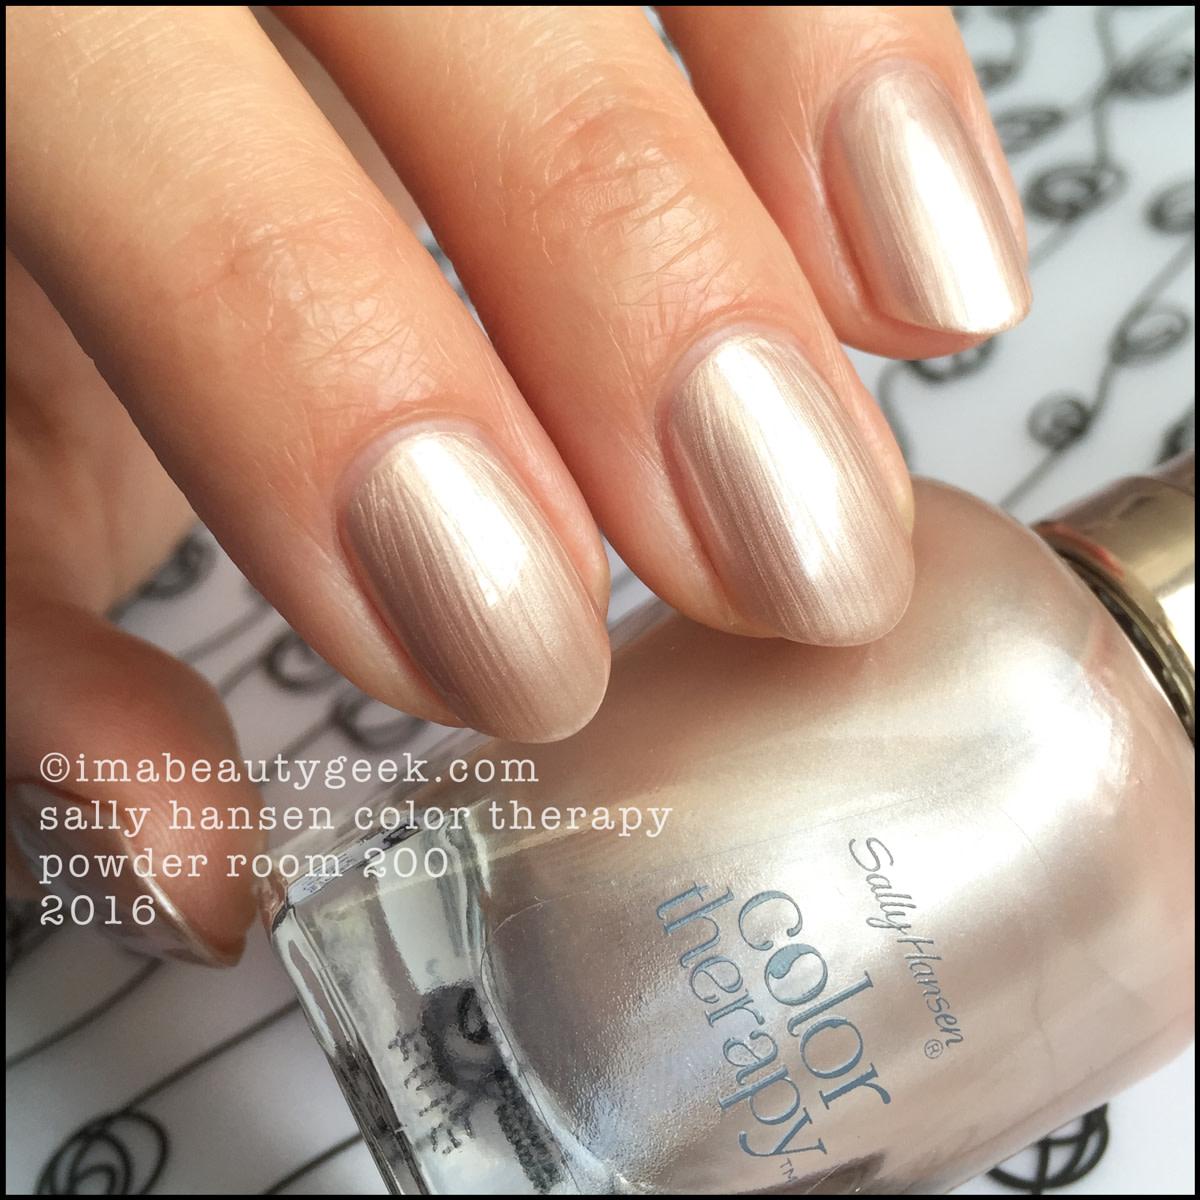 Sally Hansen Color Therapy Powder Room 200_Sally Hansen Color Therapy Nail Polish Review Swatches